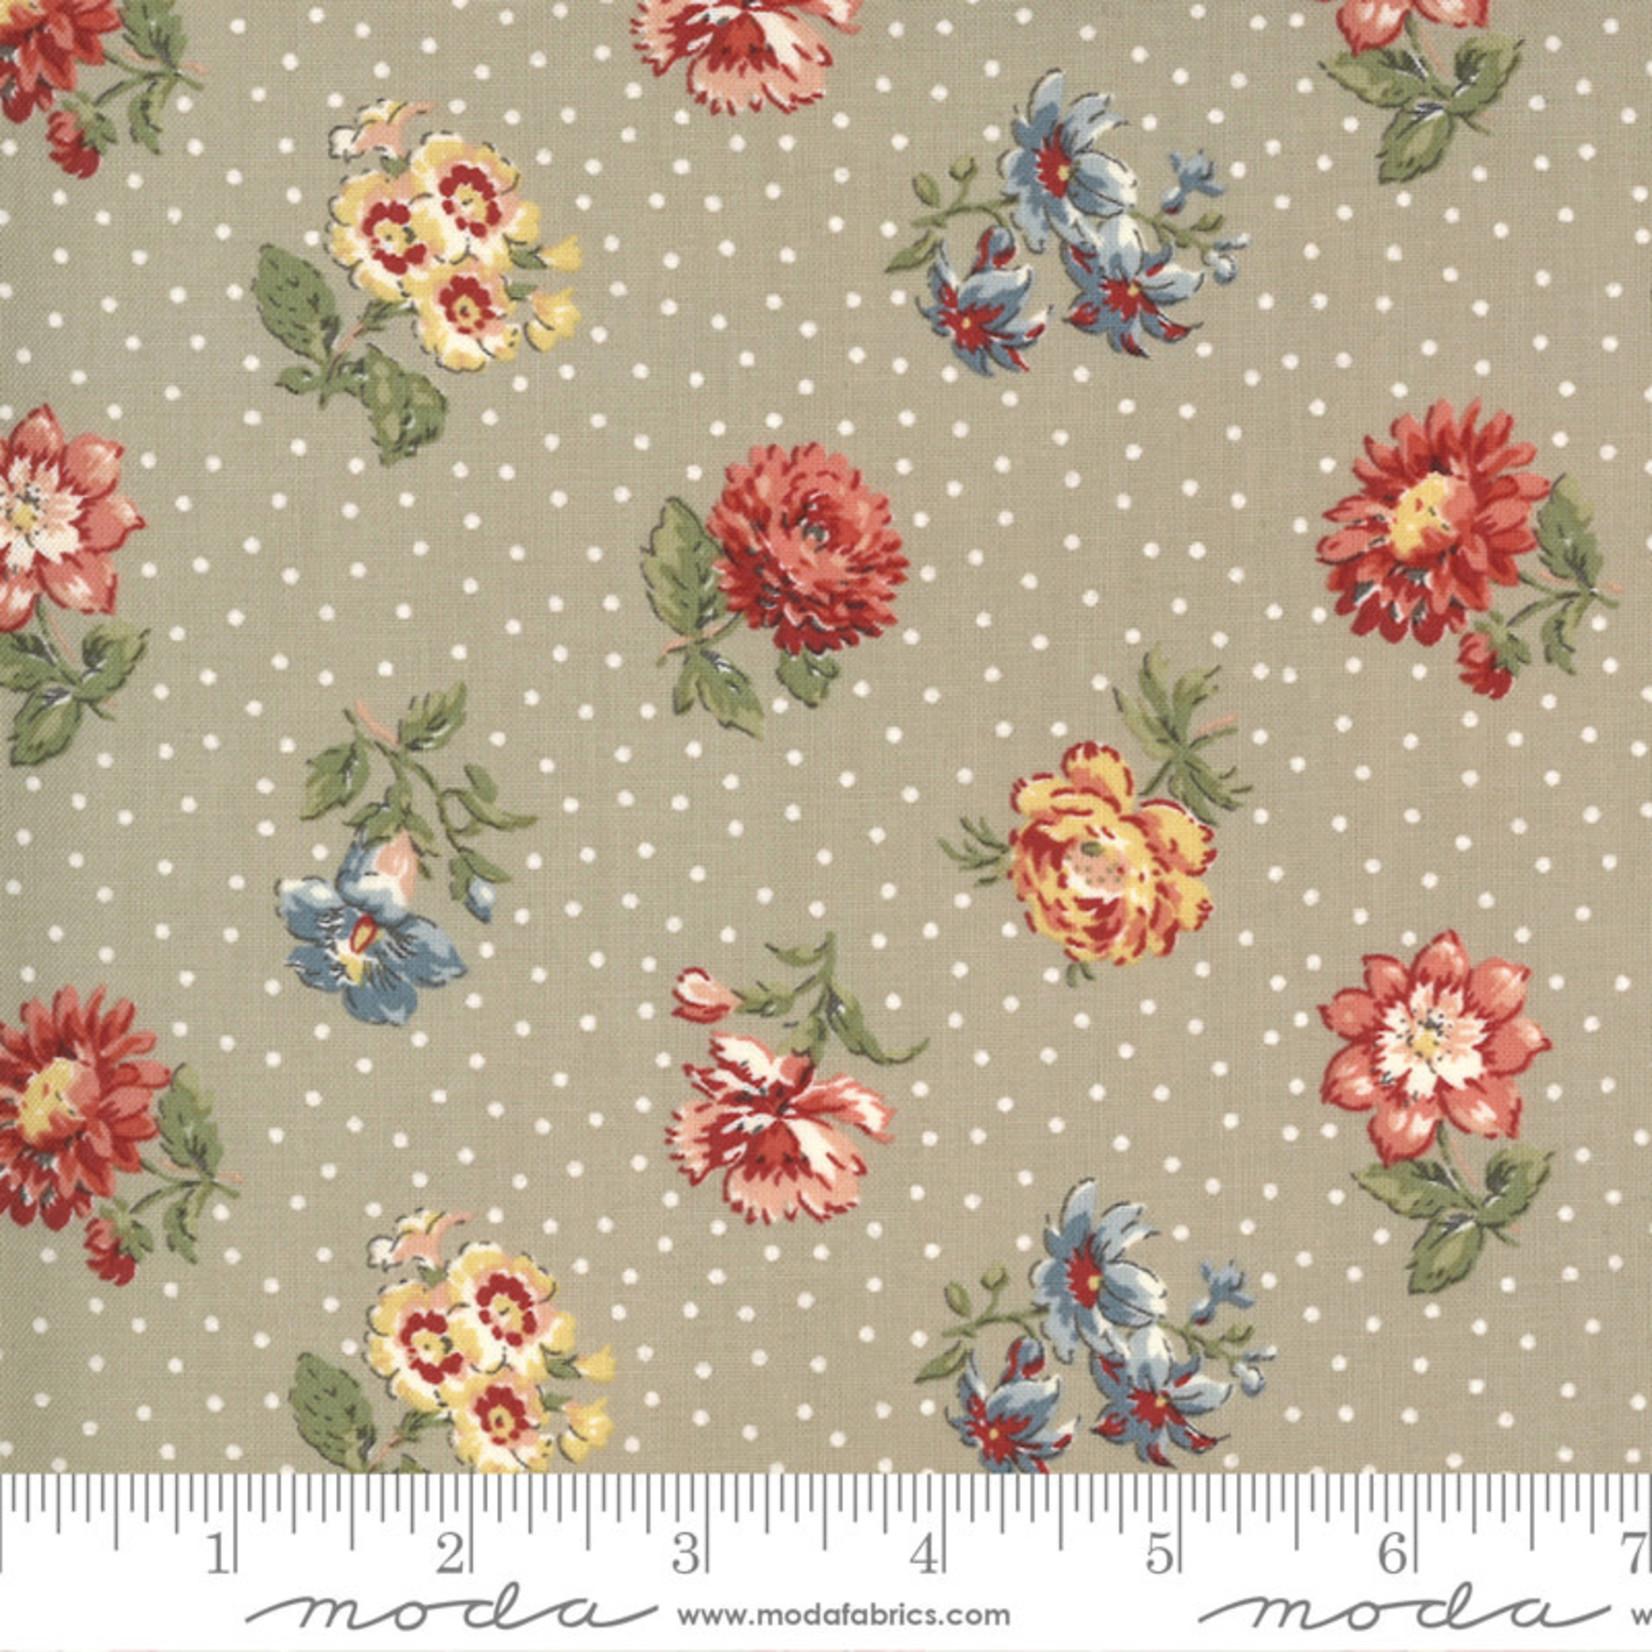 French General Jardins De Fleurs, Rayol, Roche 13893-21 $0.20 per cm or $20/m